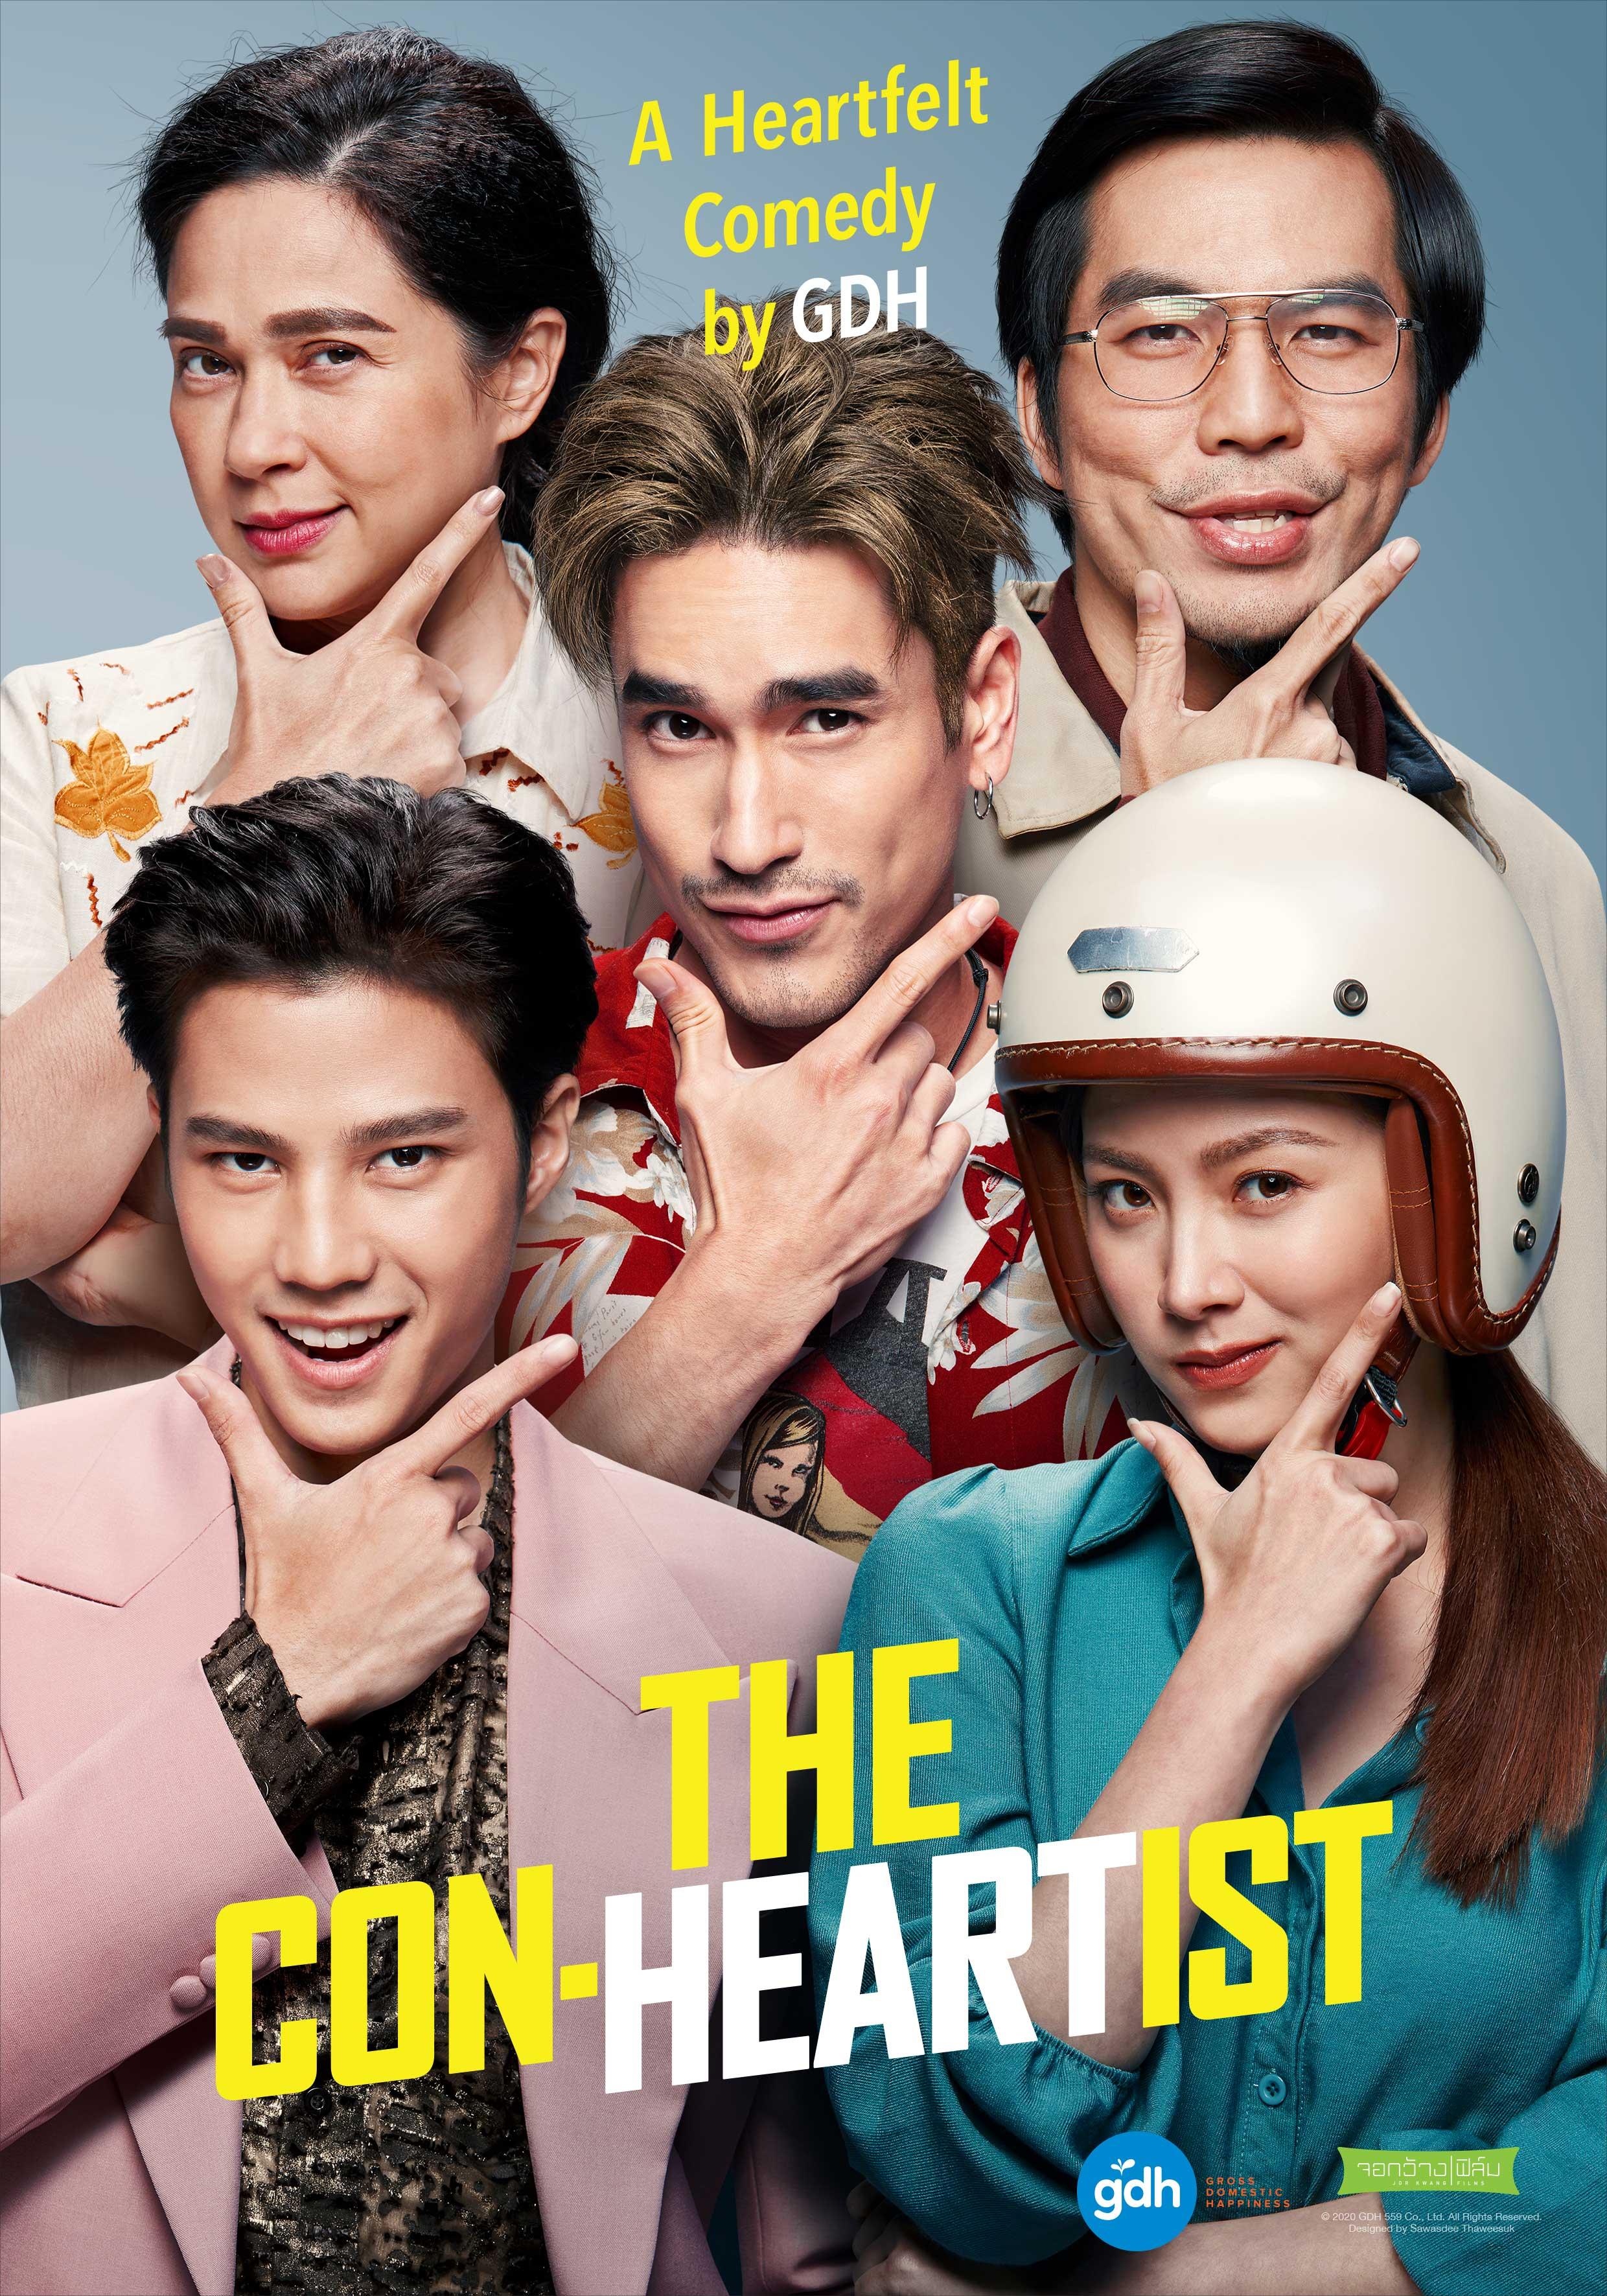 Phim Lừa Đểu Gặp Lừa Đảo - The Con-Heartist (2020)